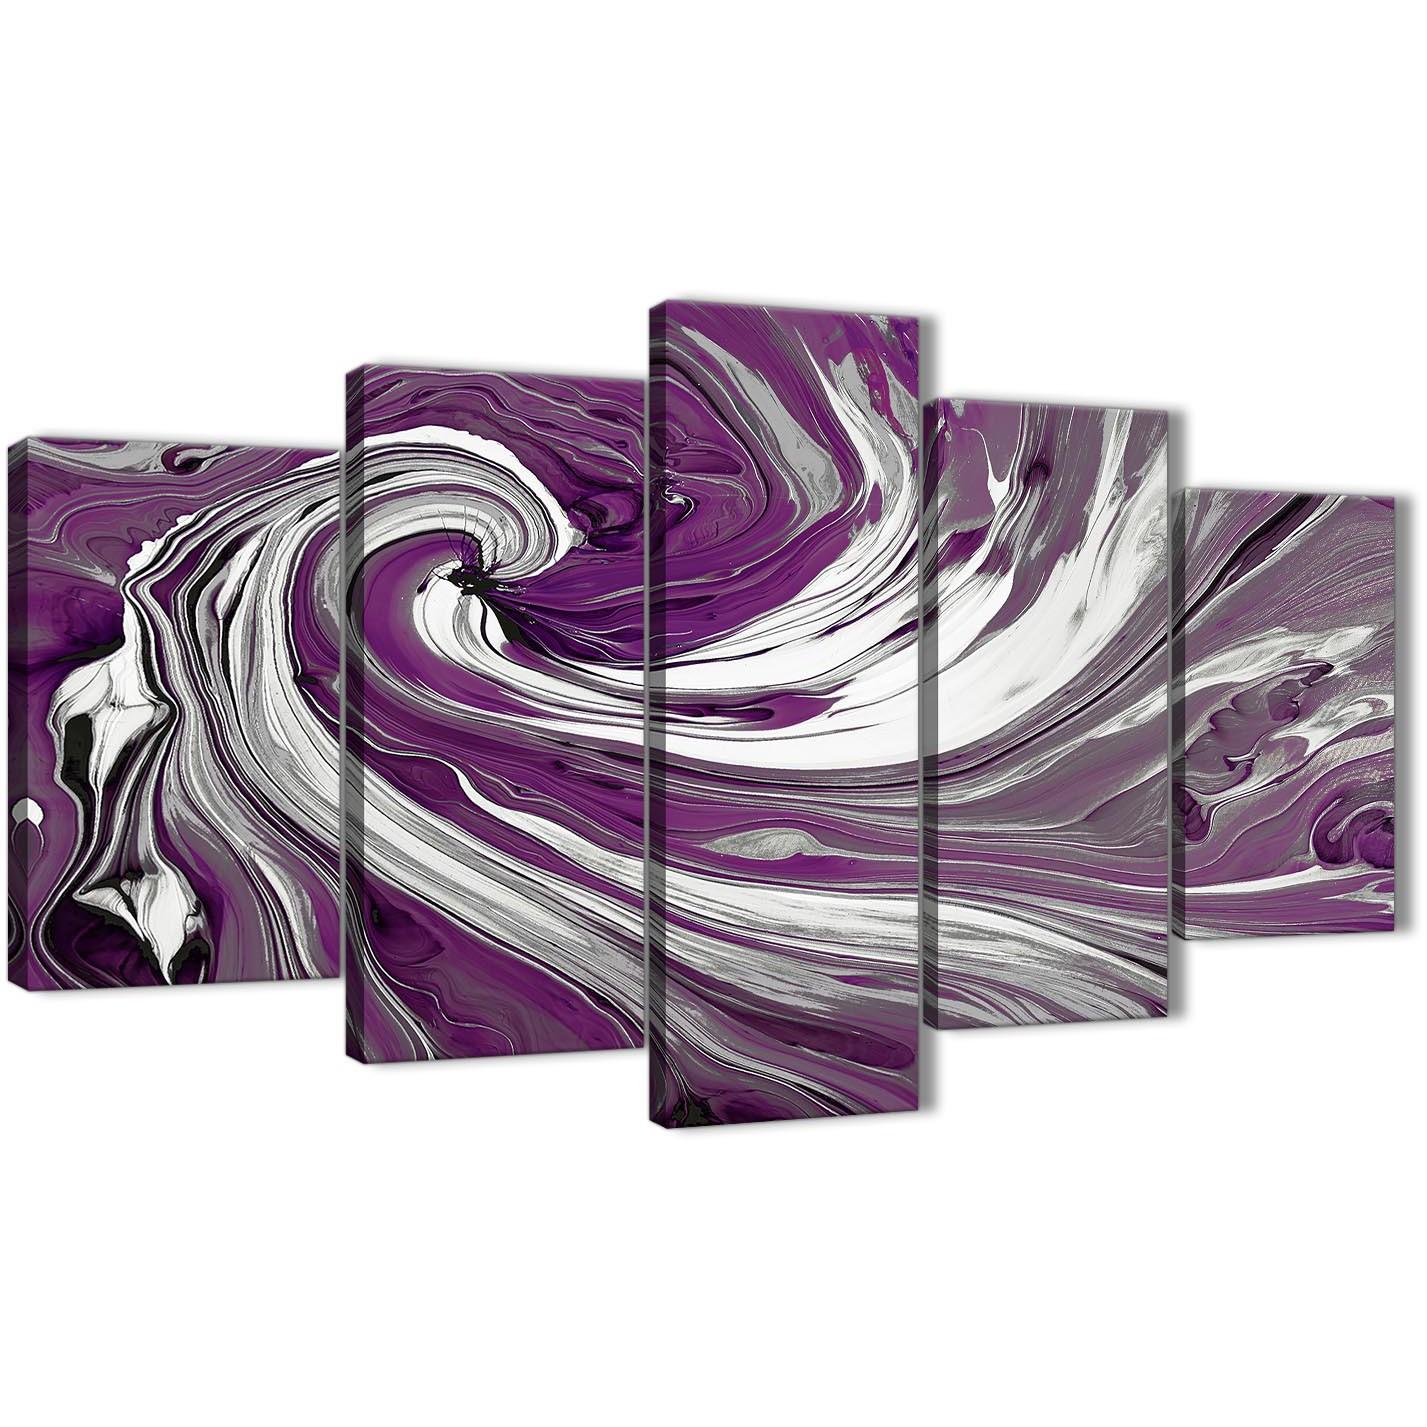 Oversized Extra Large Plum Purple White Swirls Modern Abstract Canvas Wall  Art Split 5 Panel 160cm Display Gallery Item 1 ...